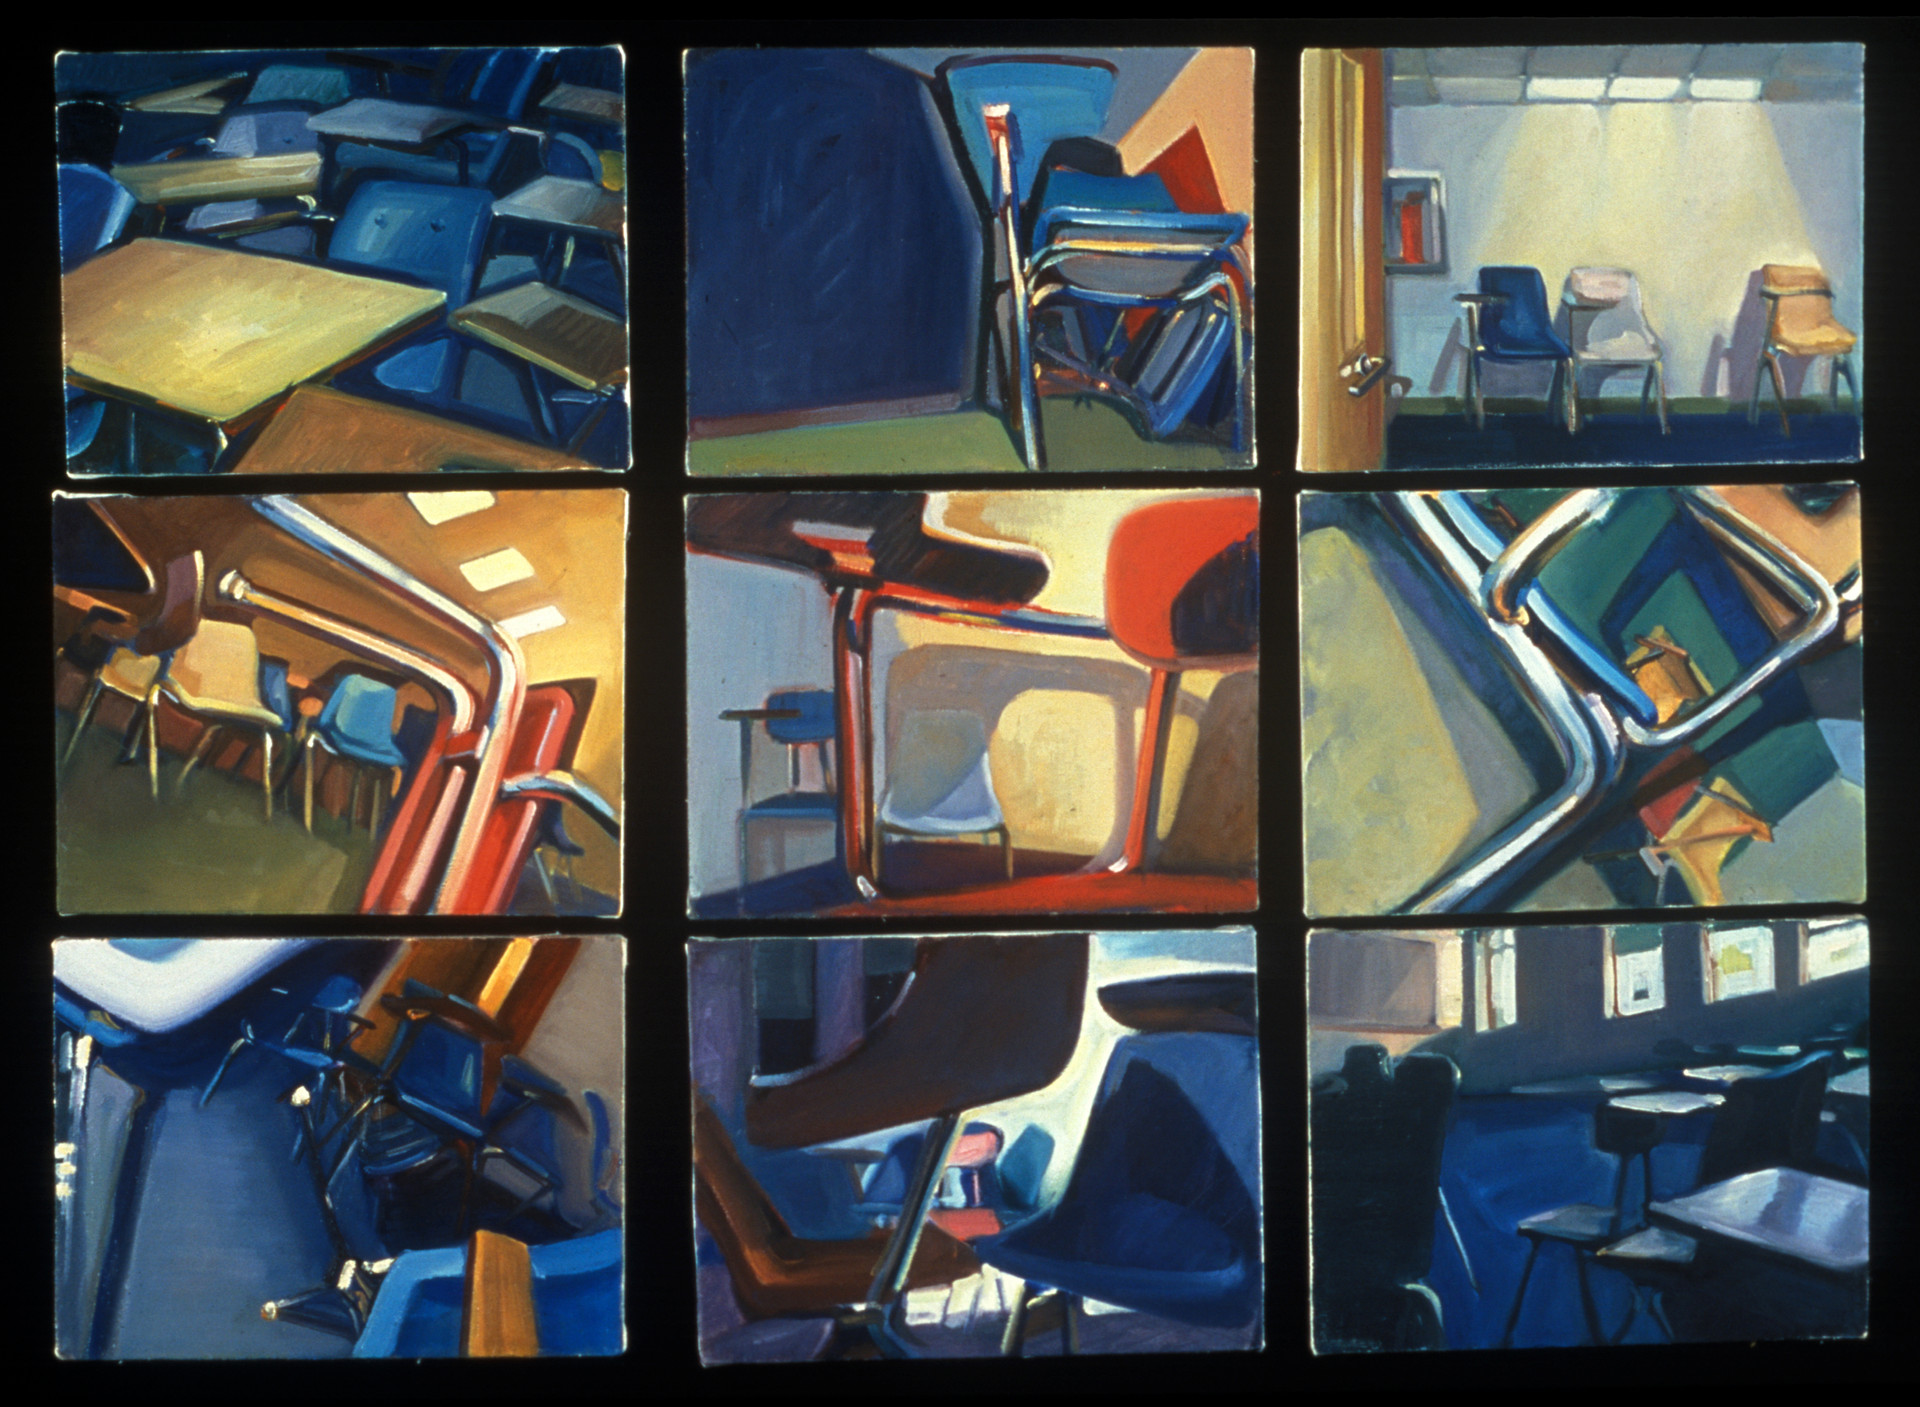 School Chairs I